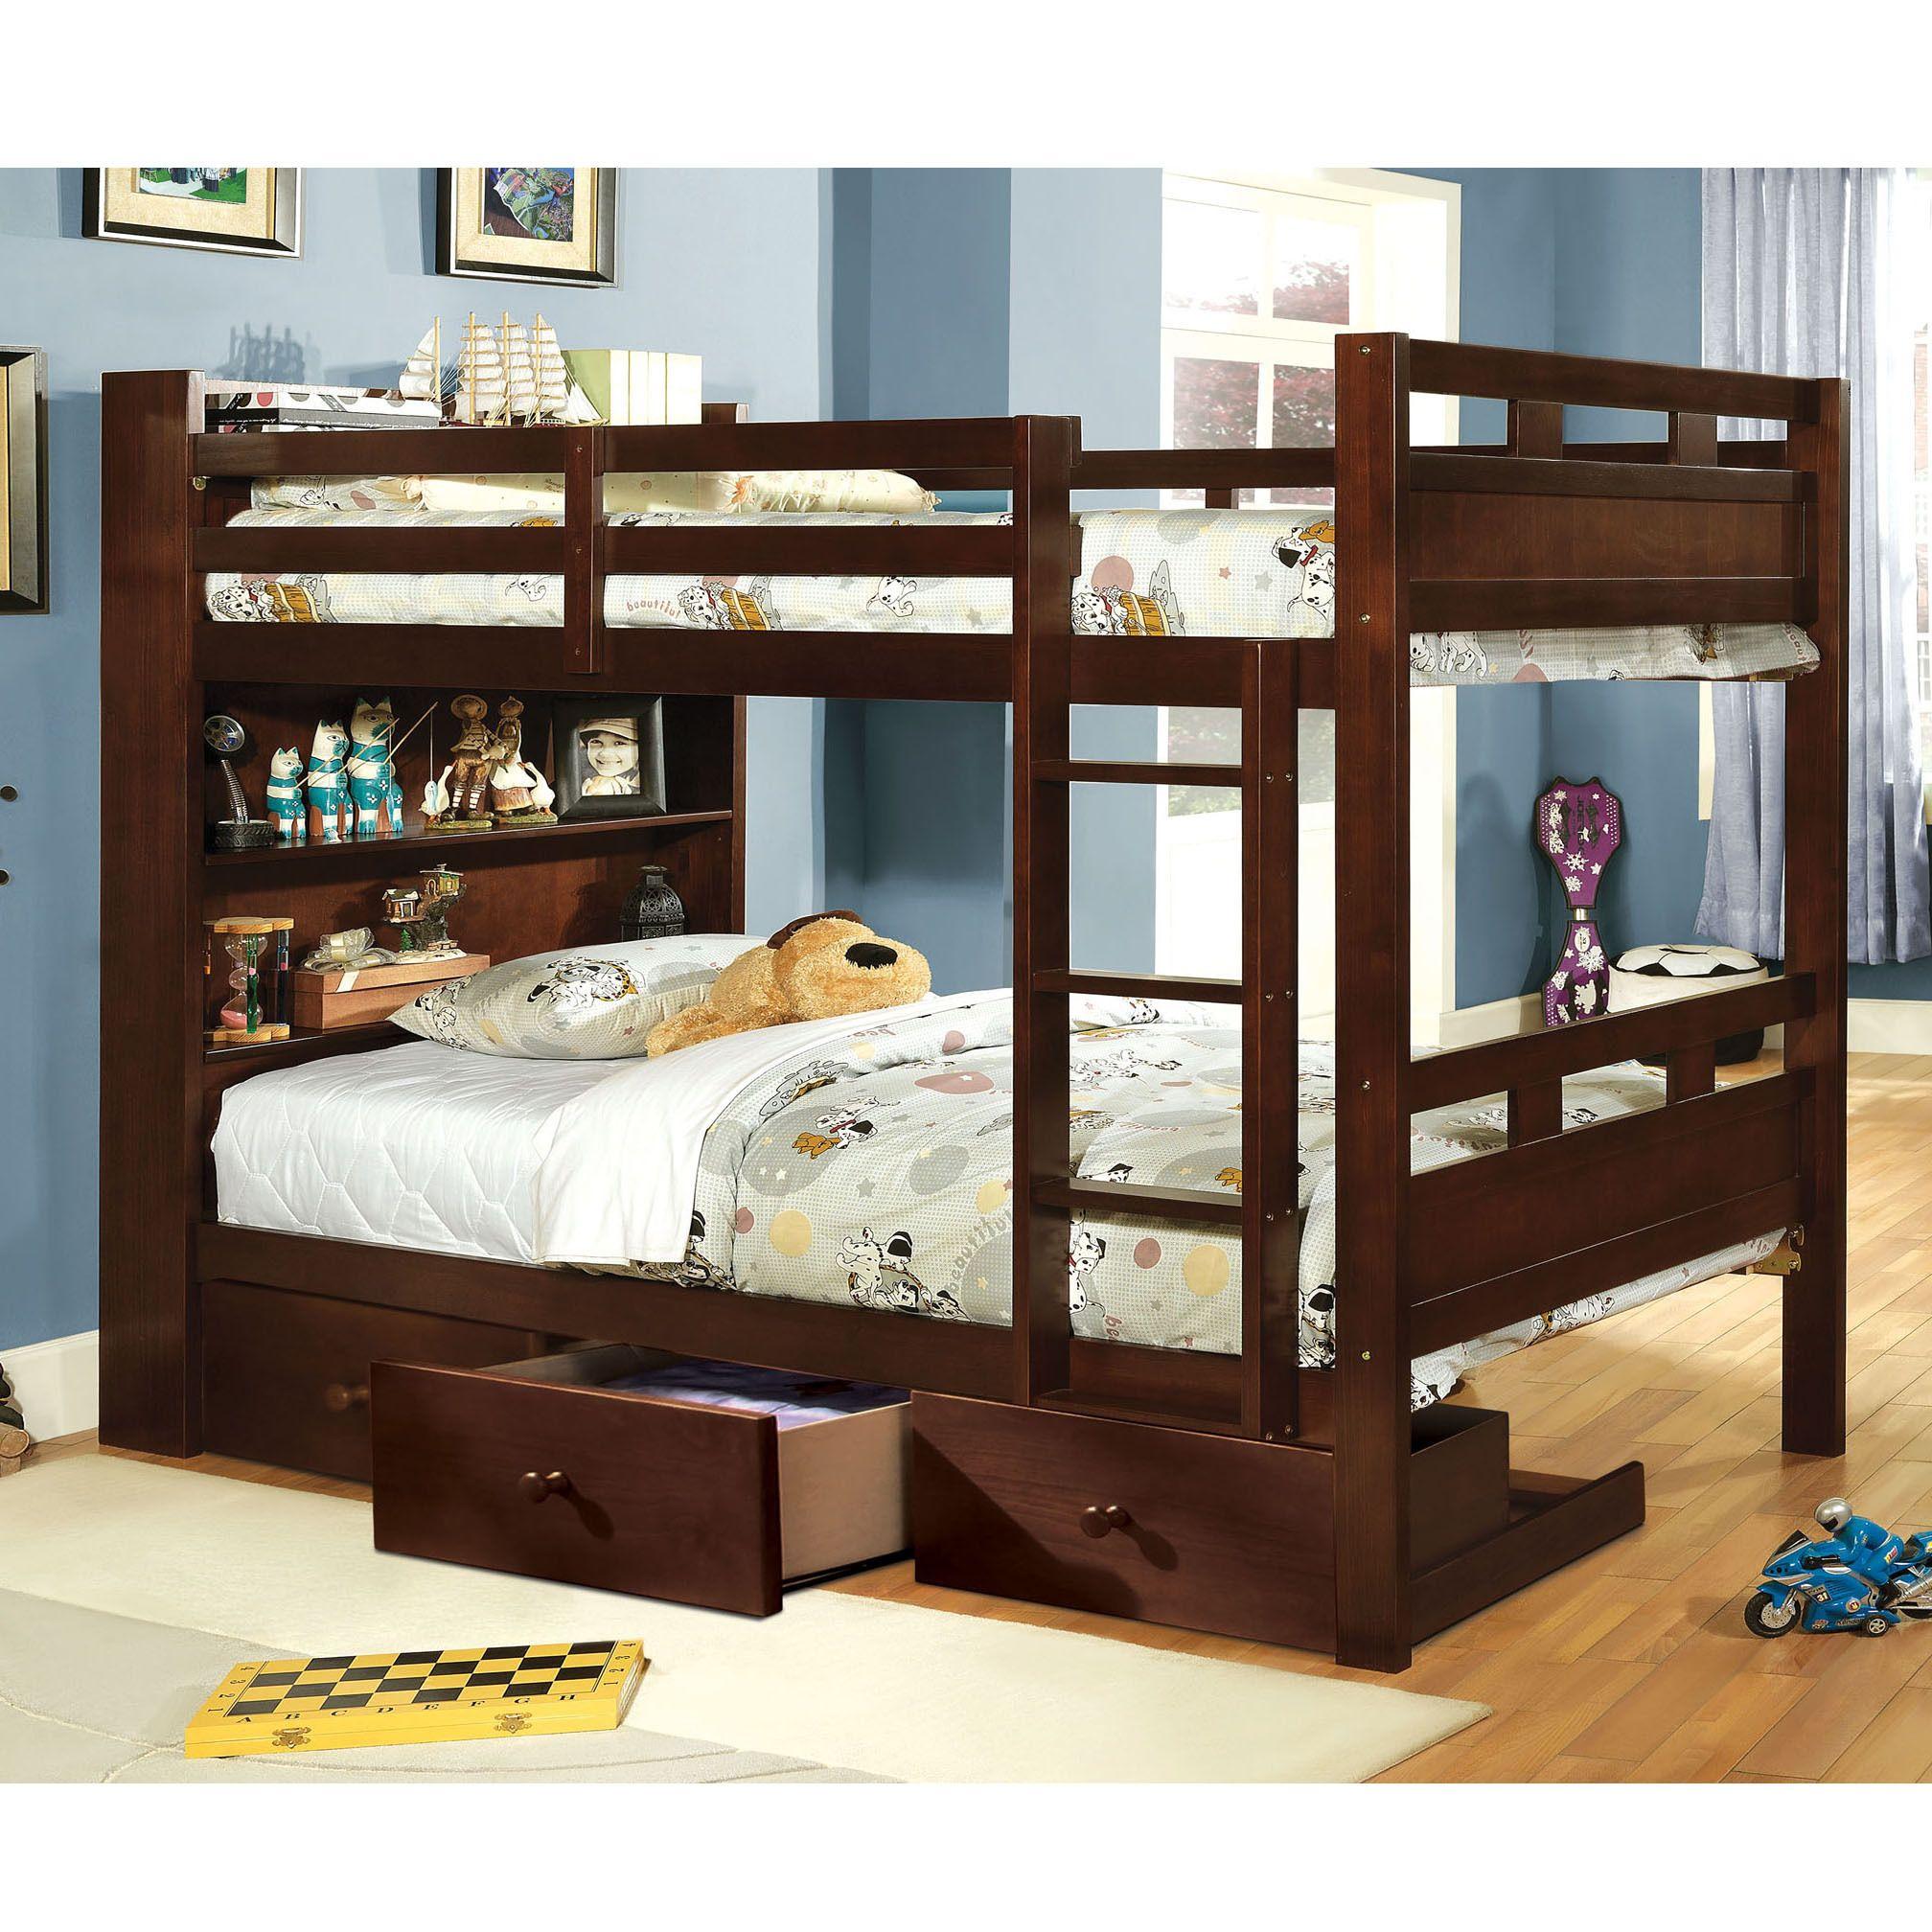 Twin loft bed ideas  Furniture of America Chessin Dark Walnut Bunk Bed with BuiltIn